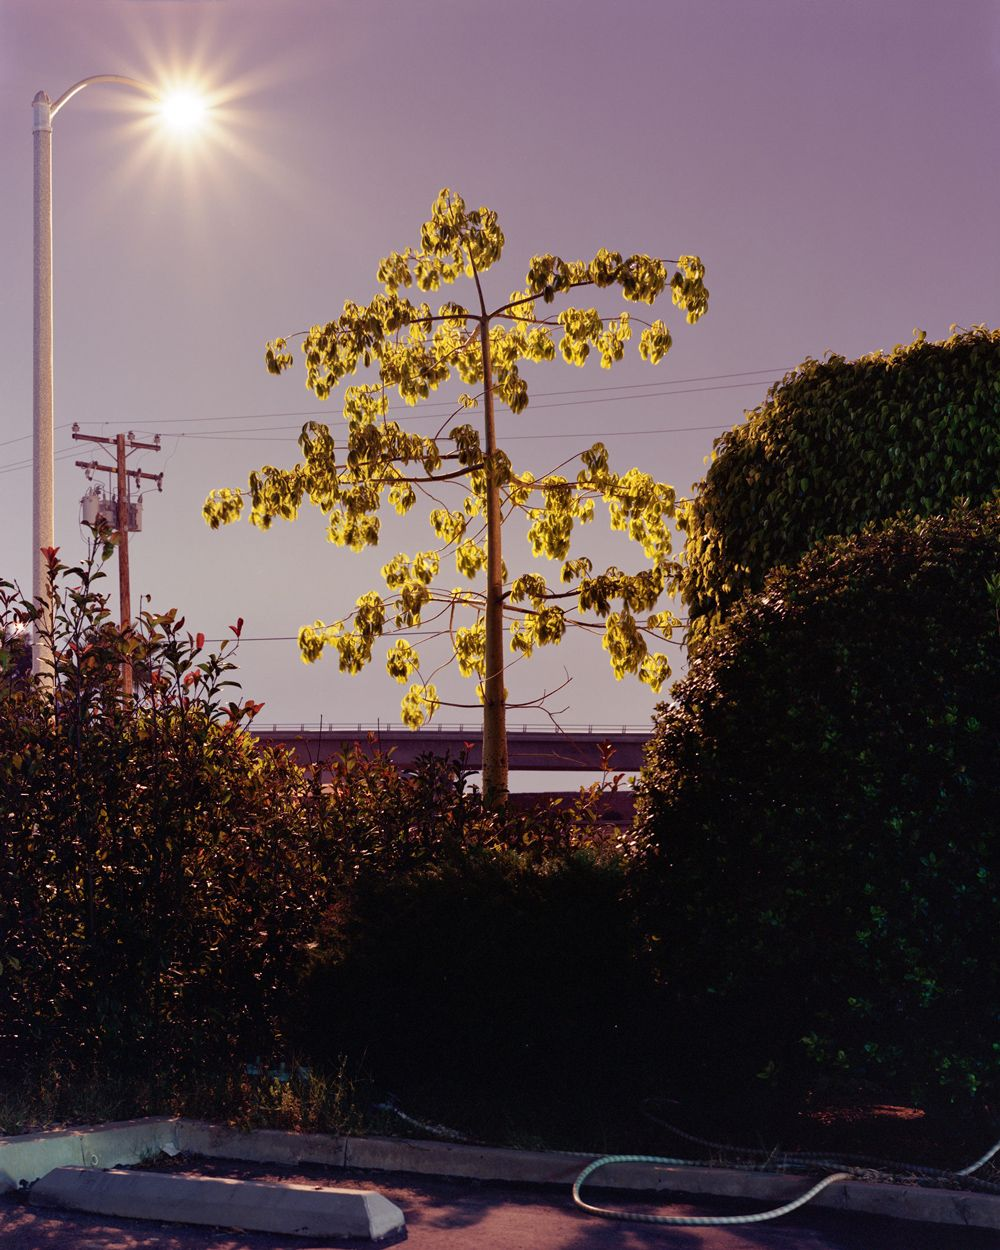 Ayuson_young_tree_Playa_Del_Rey_800kb.jpg